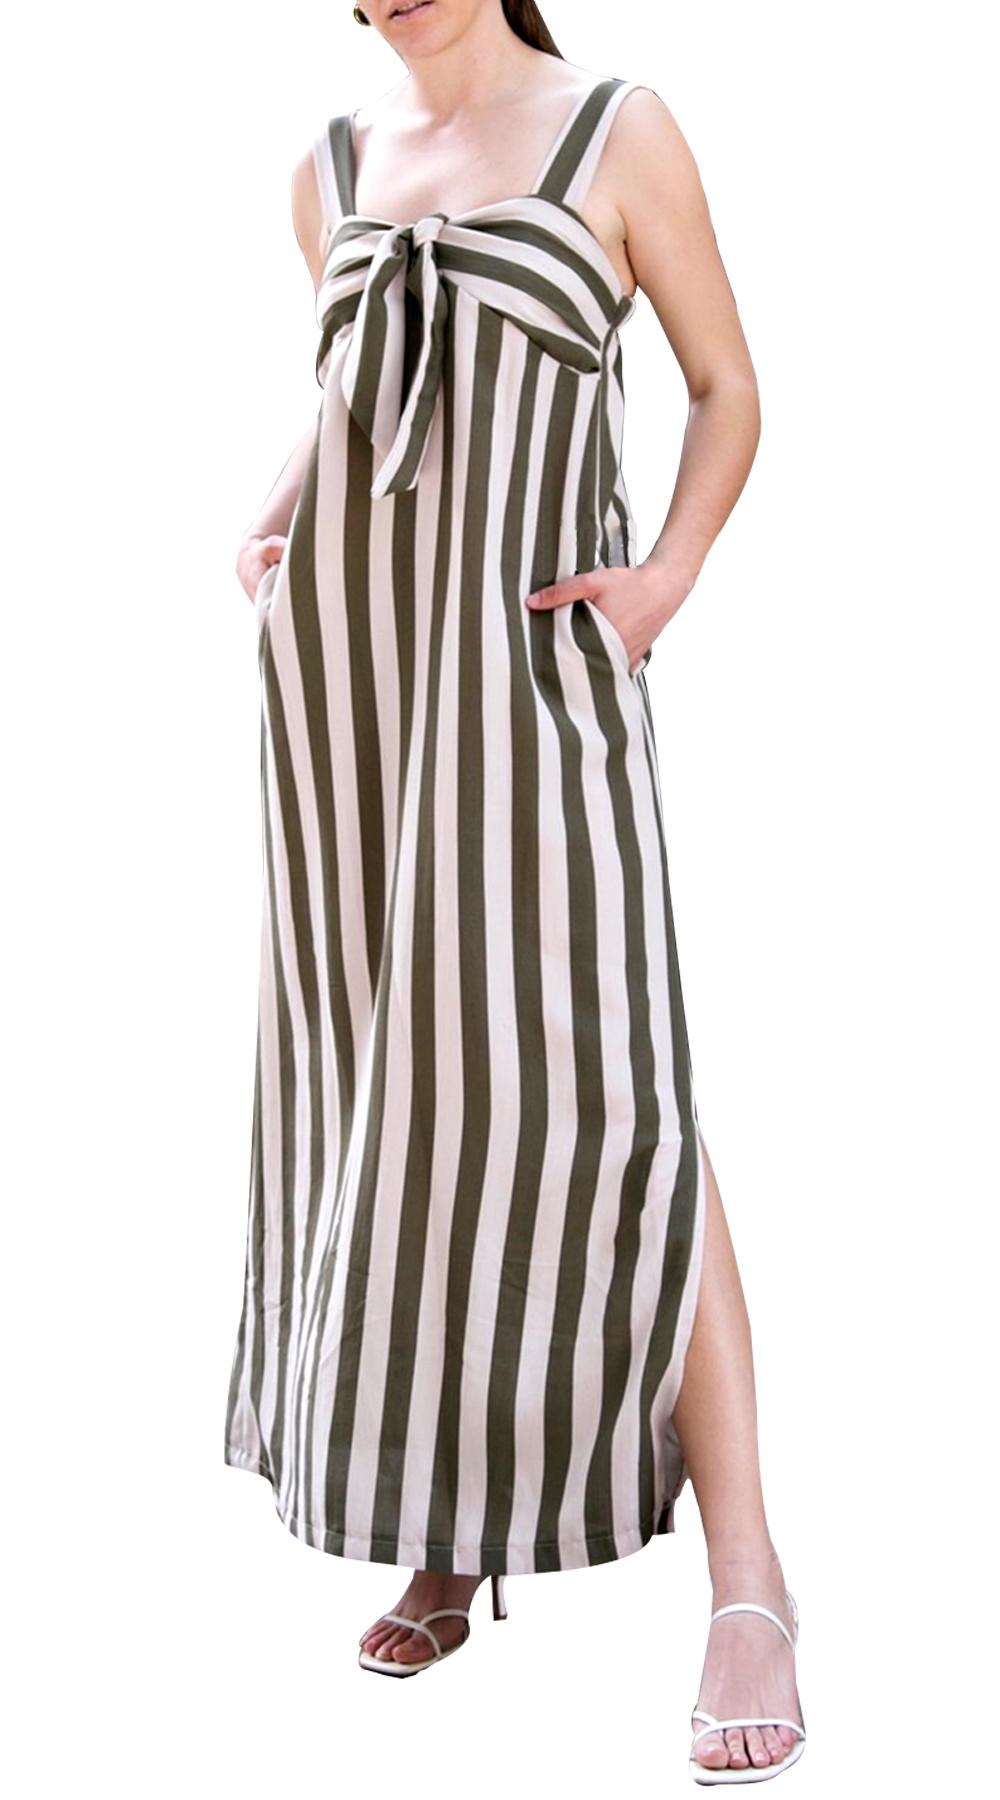 c951a837bf51 Μάξι Ριγέ Φόρεμα με τσέπες